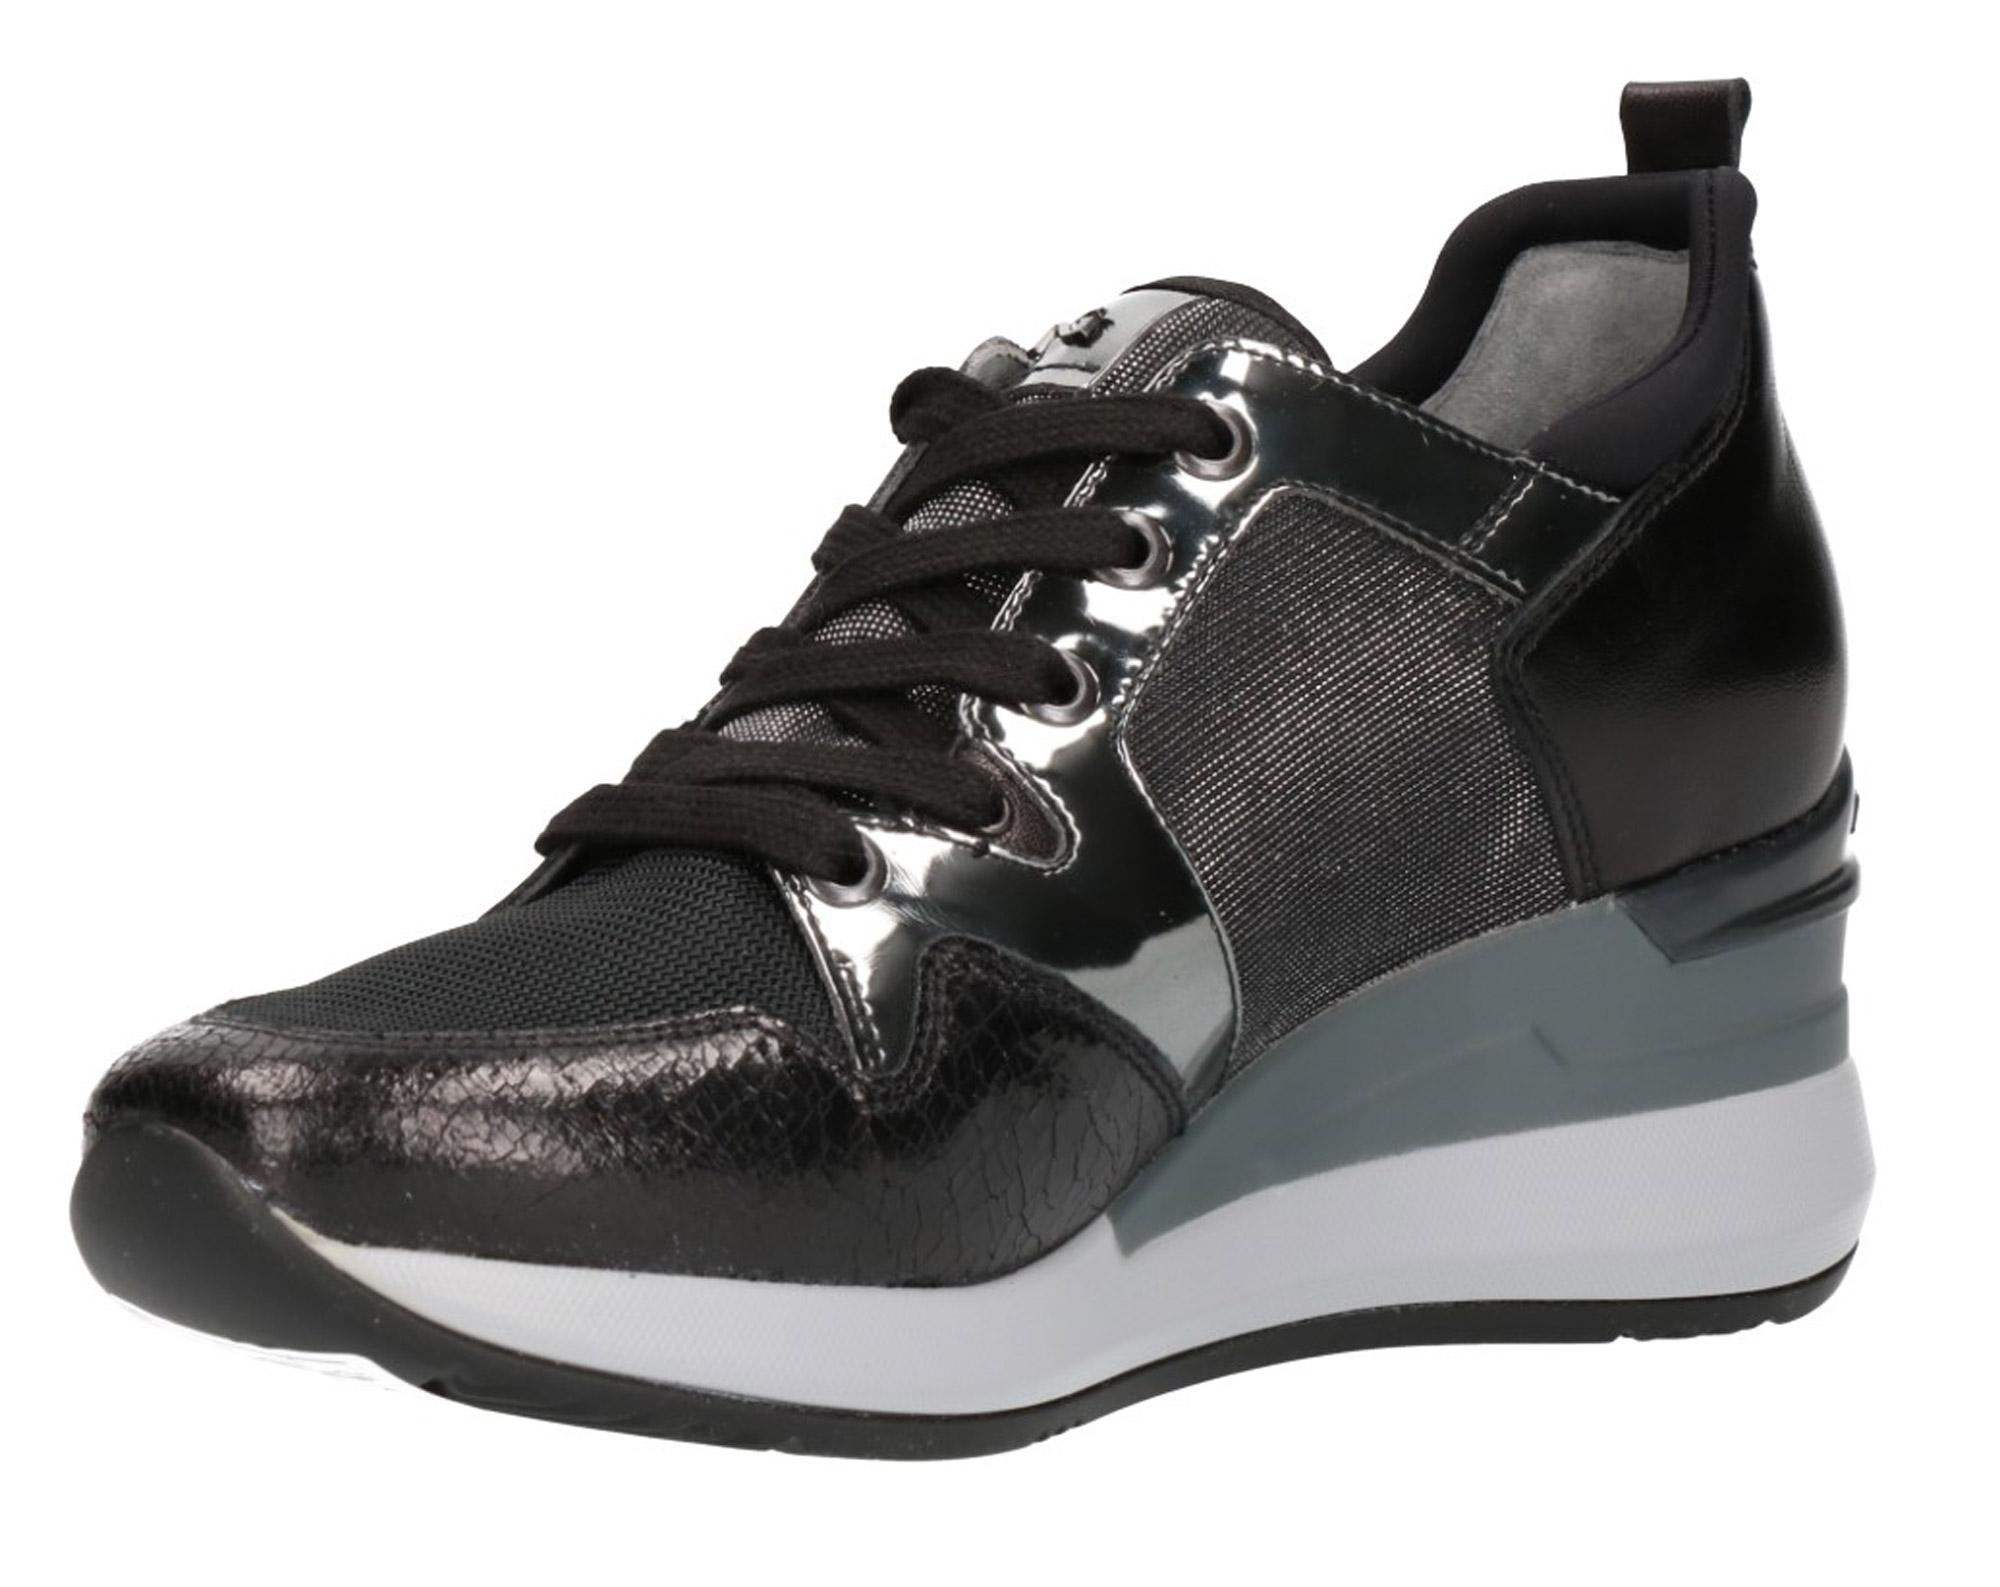 Sneaker 6610 A806610 Nerogiardini Con Scarpe Sportive 135 Zeppa wZU1w07r